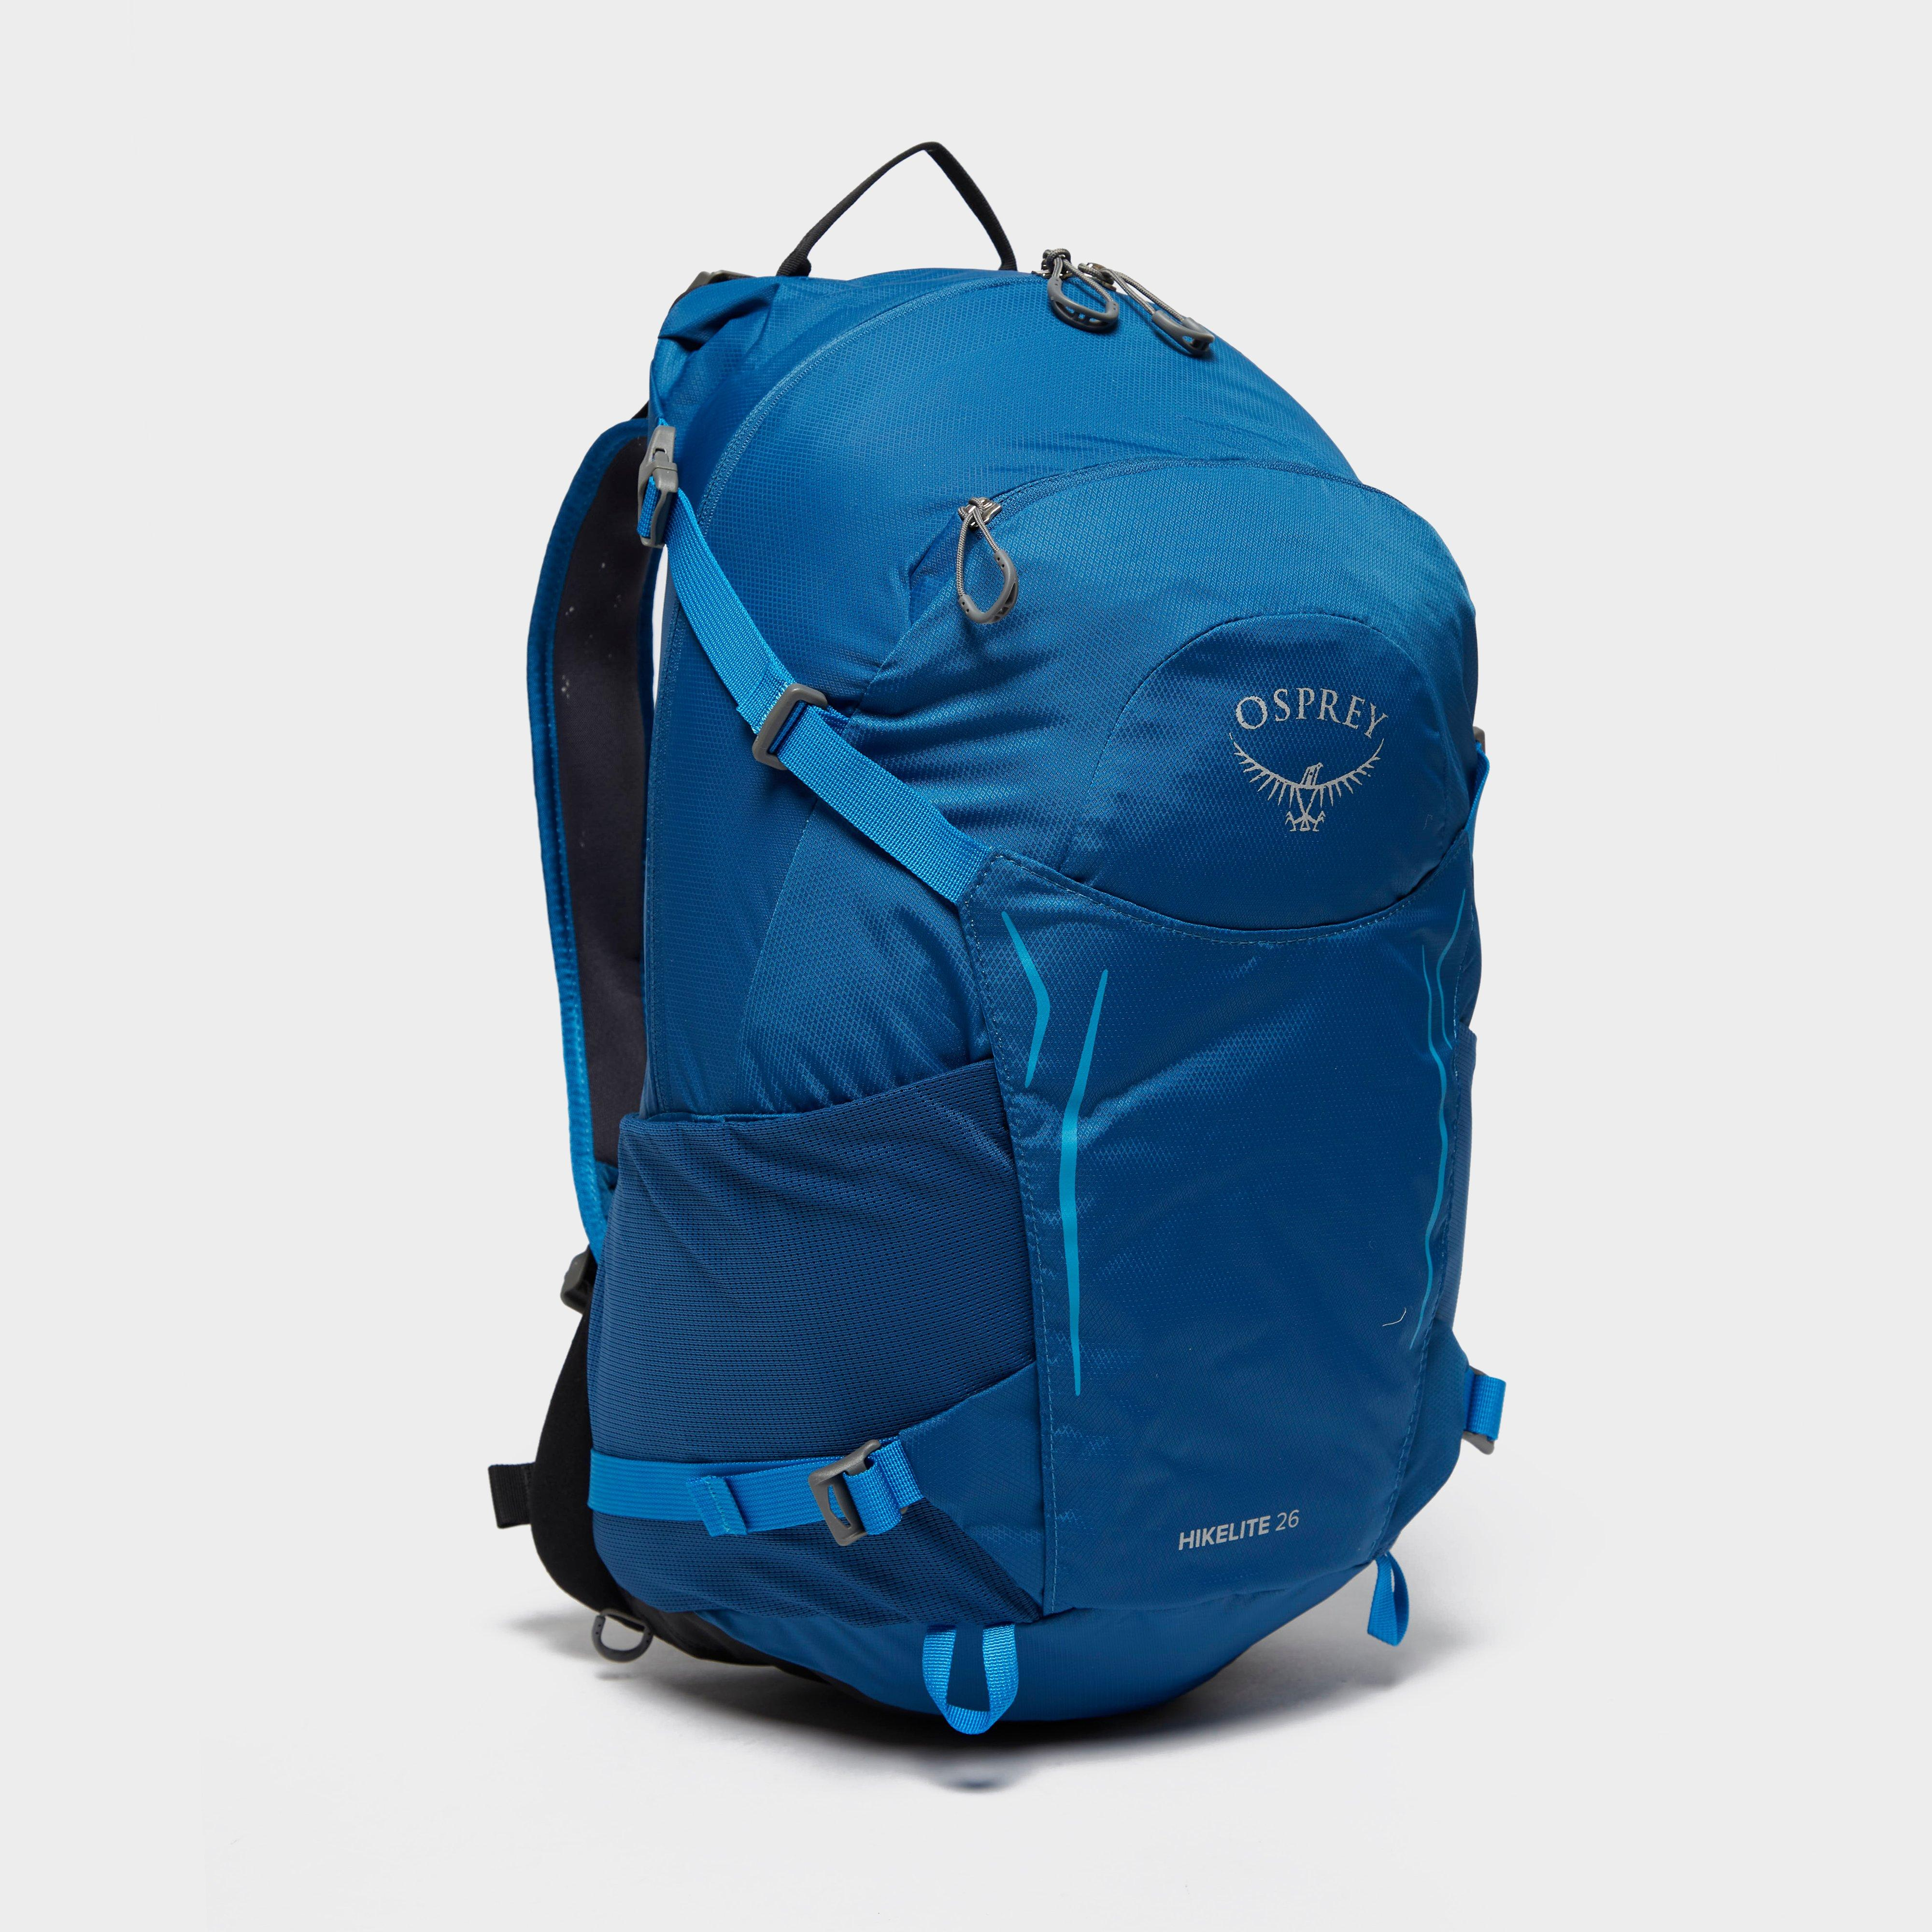 Osprey Hikelite 26 Daypack - Blue, Blue